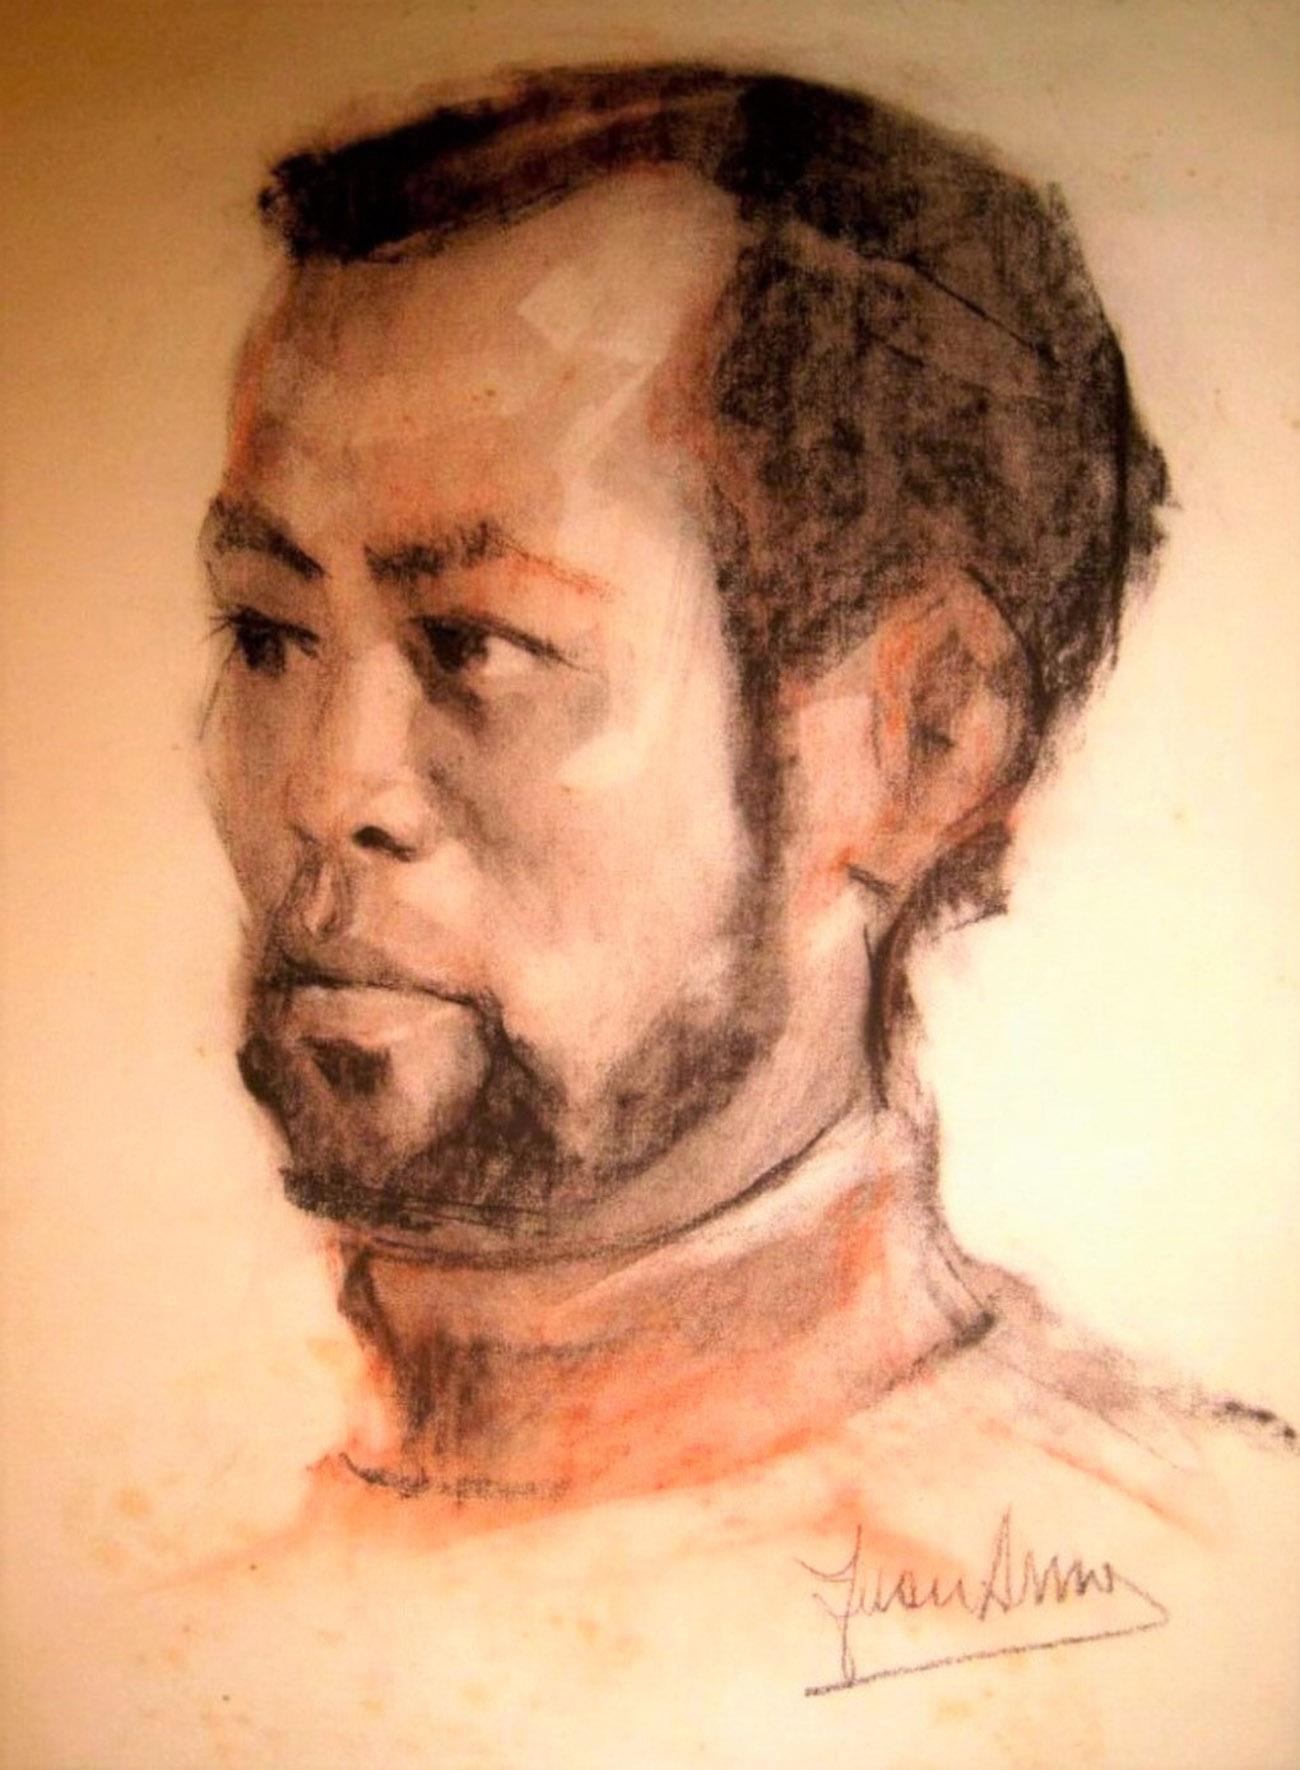 FEDERICO ALGUILAR ALCUÁZ. Retrato Dibujo de Juan Amo.